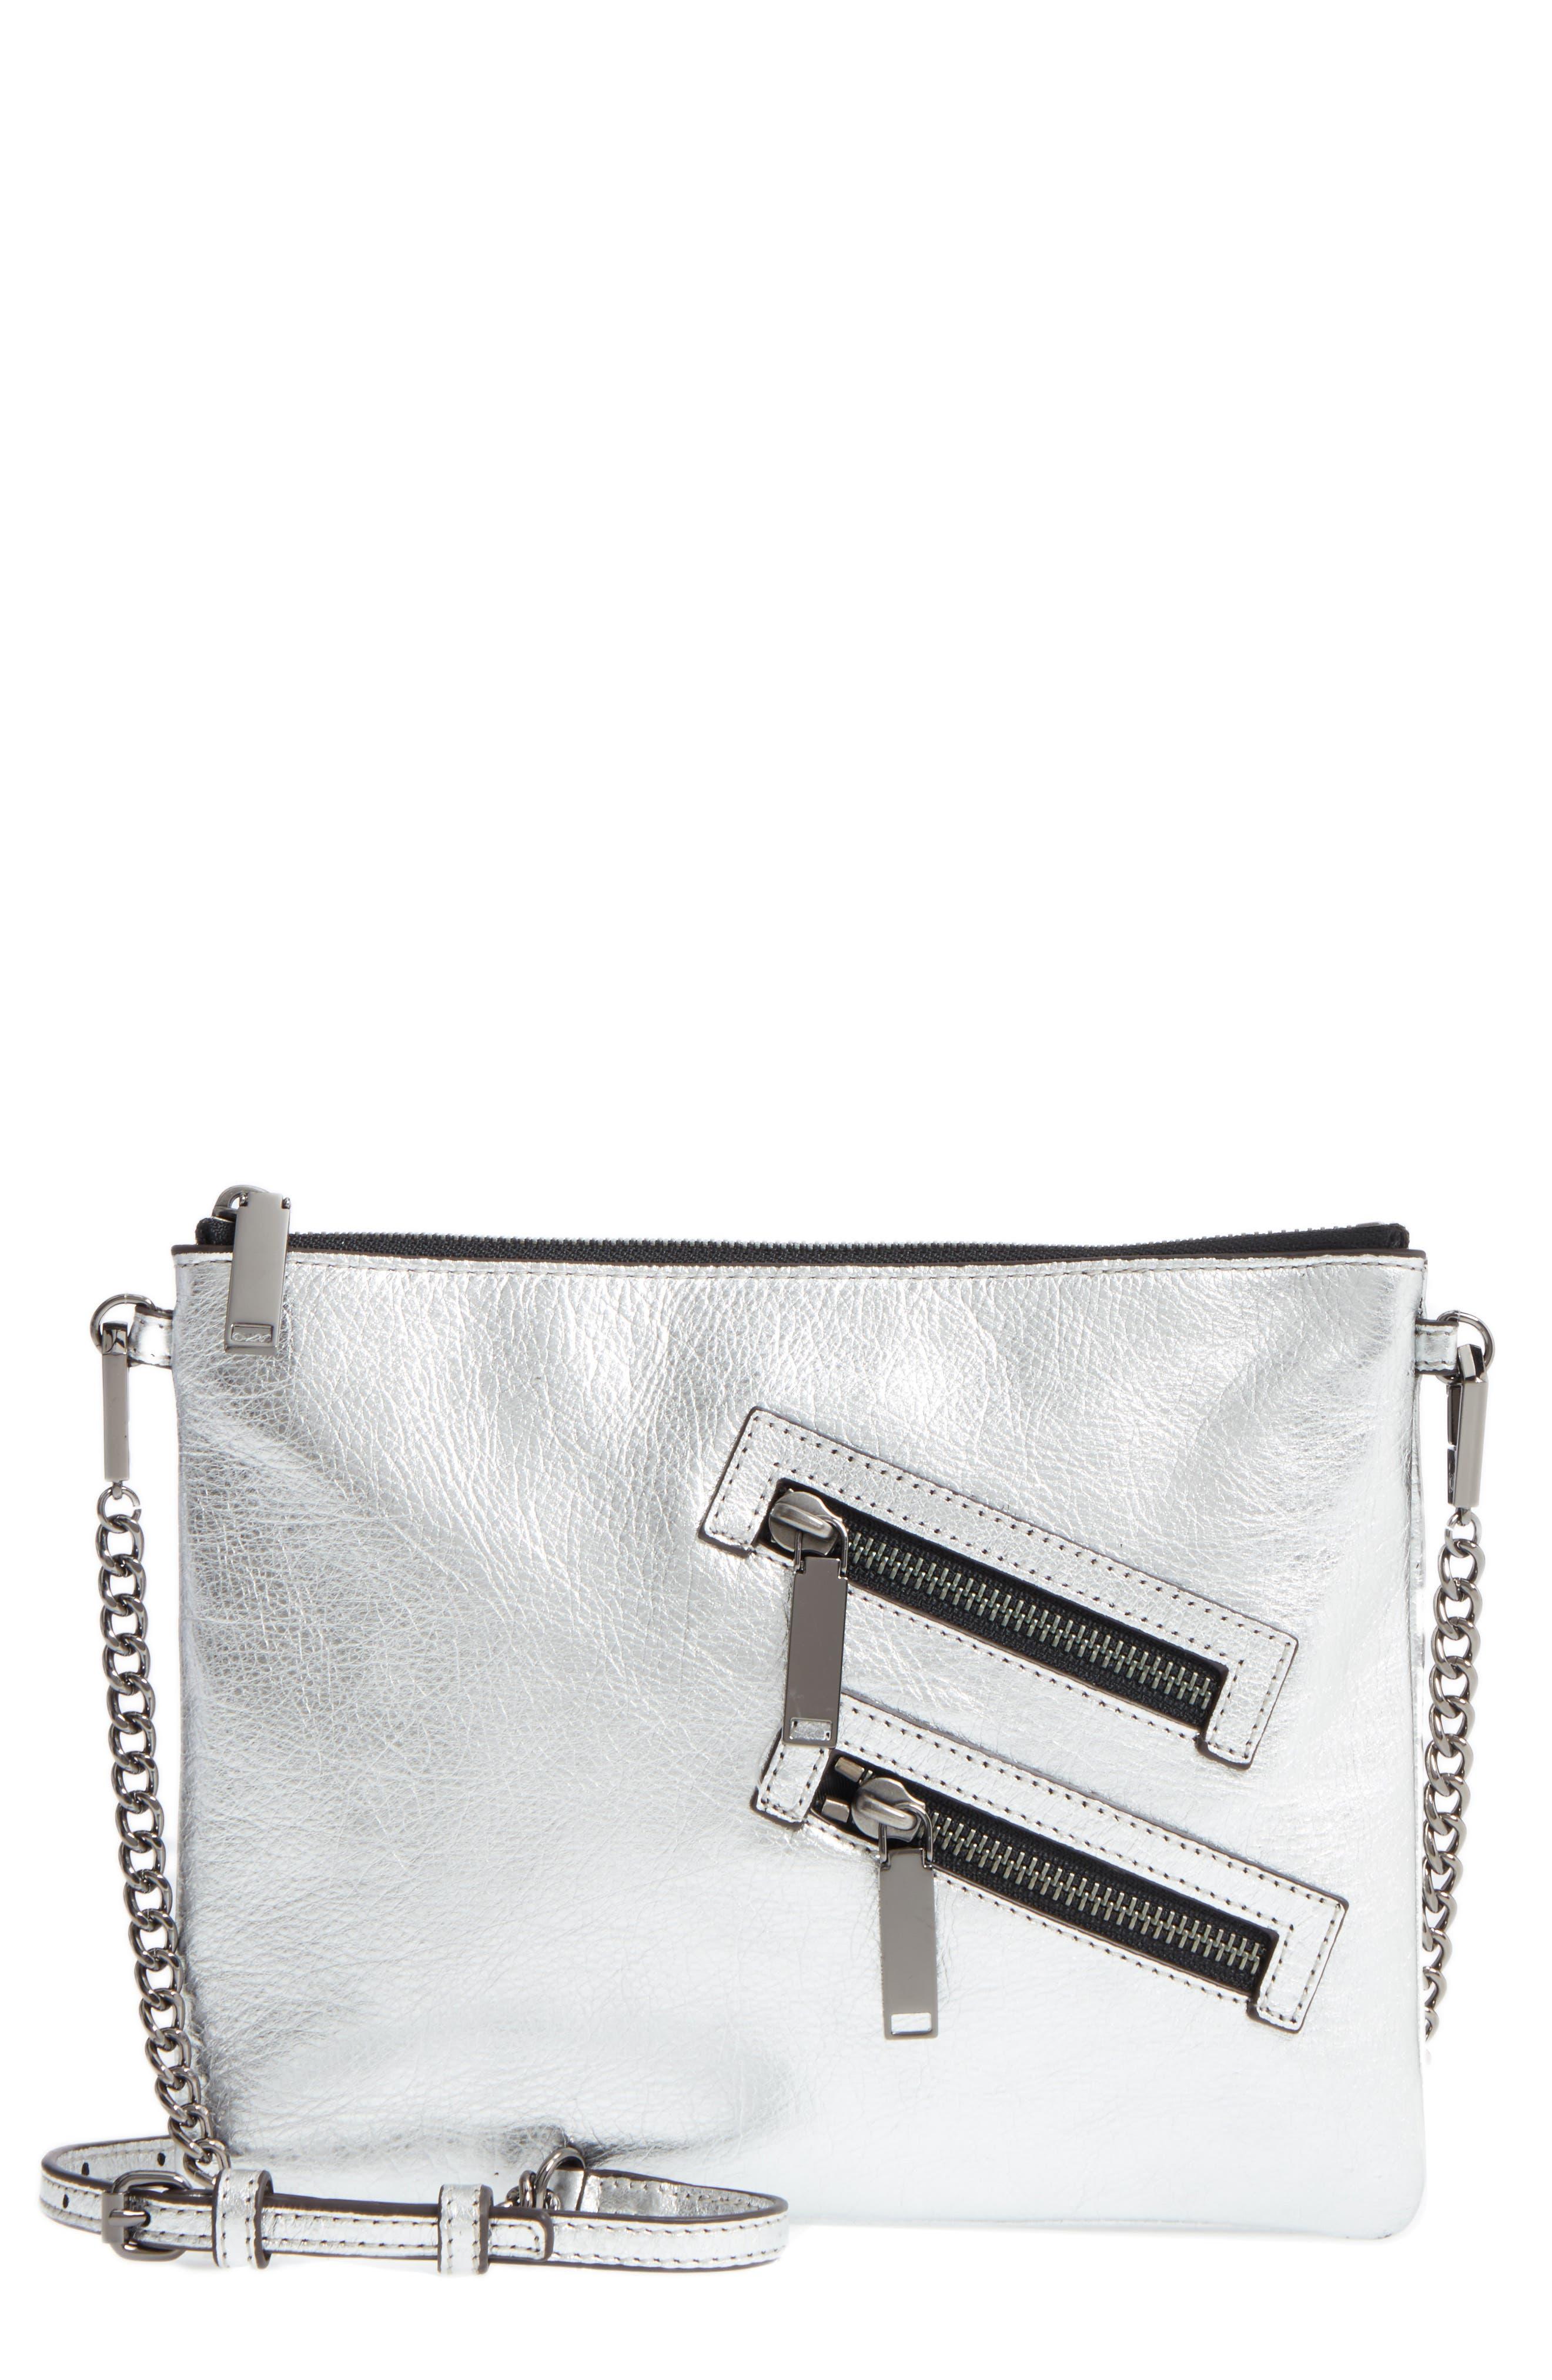 Jon Leather Crossbody Bag,                             Main thumbnail 1, color,                             Silver